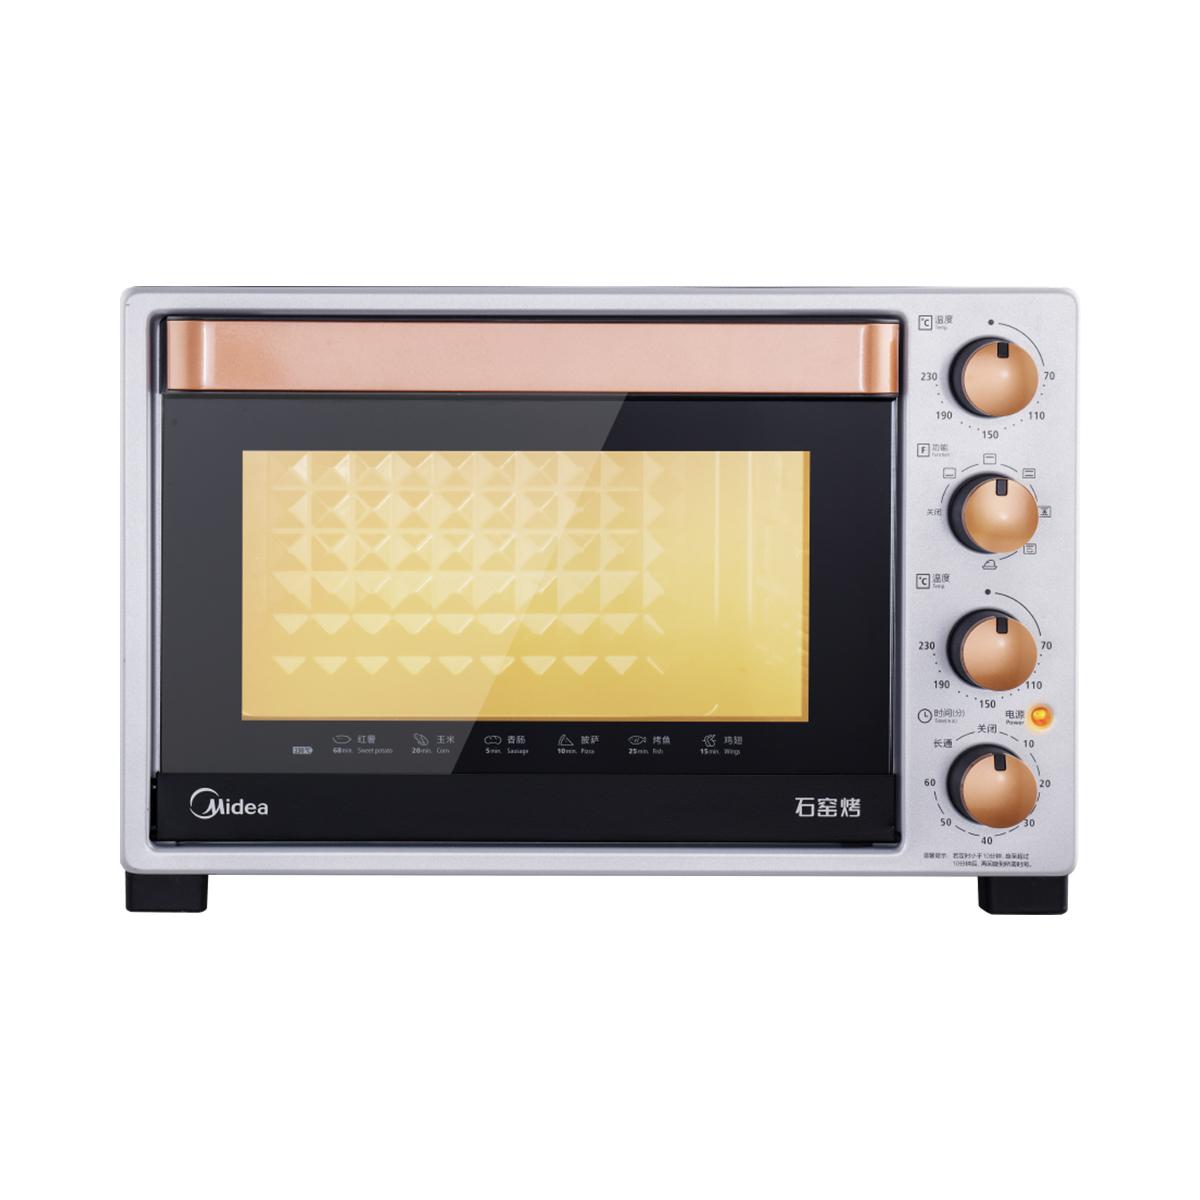 Midea/美的 T3-L324D银色电烤箱 说明书.pdf